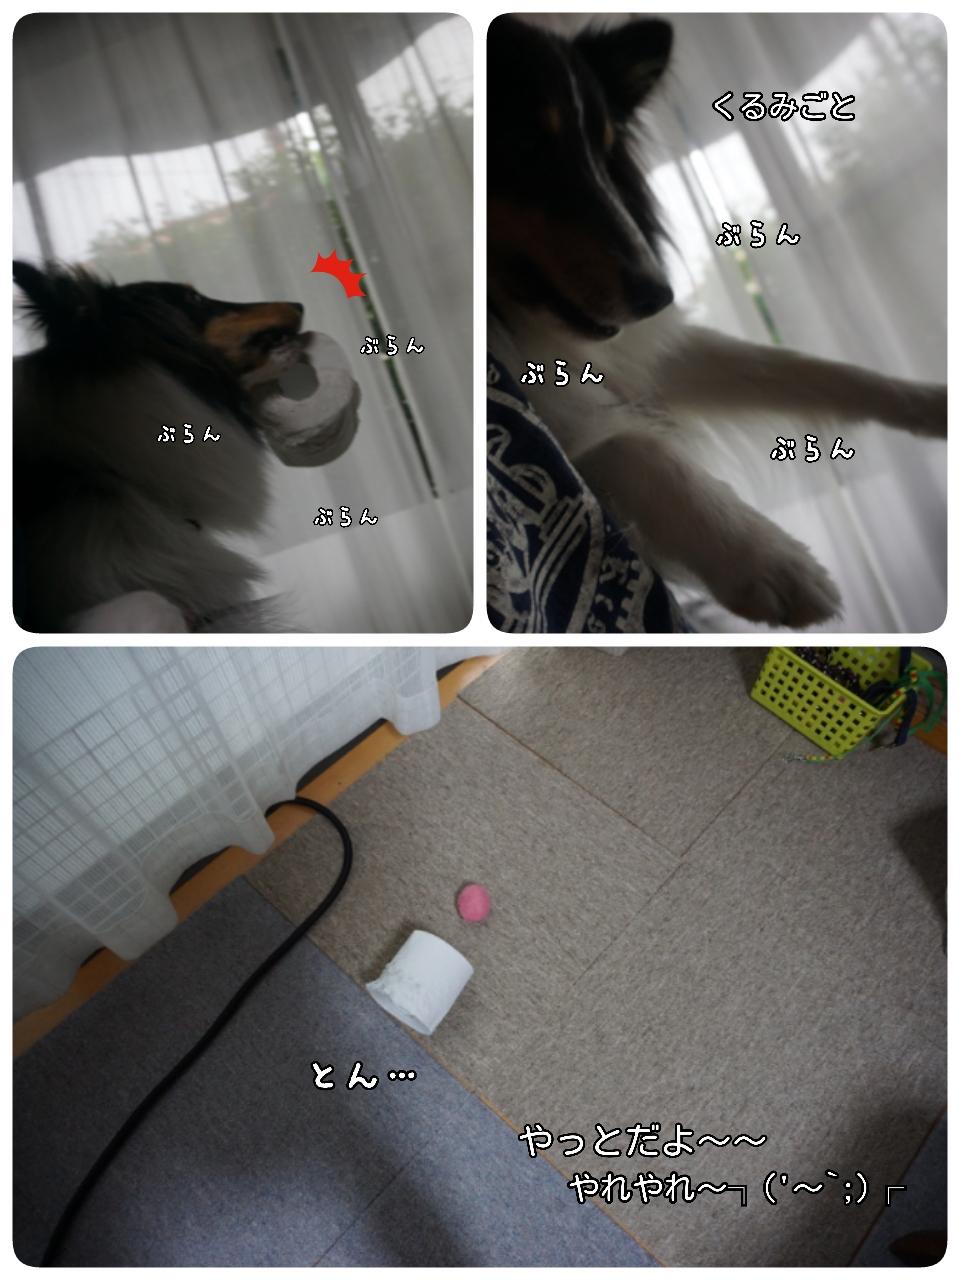 16-09-20-16-46-43-633_deco.jpg